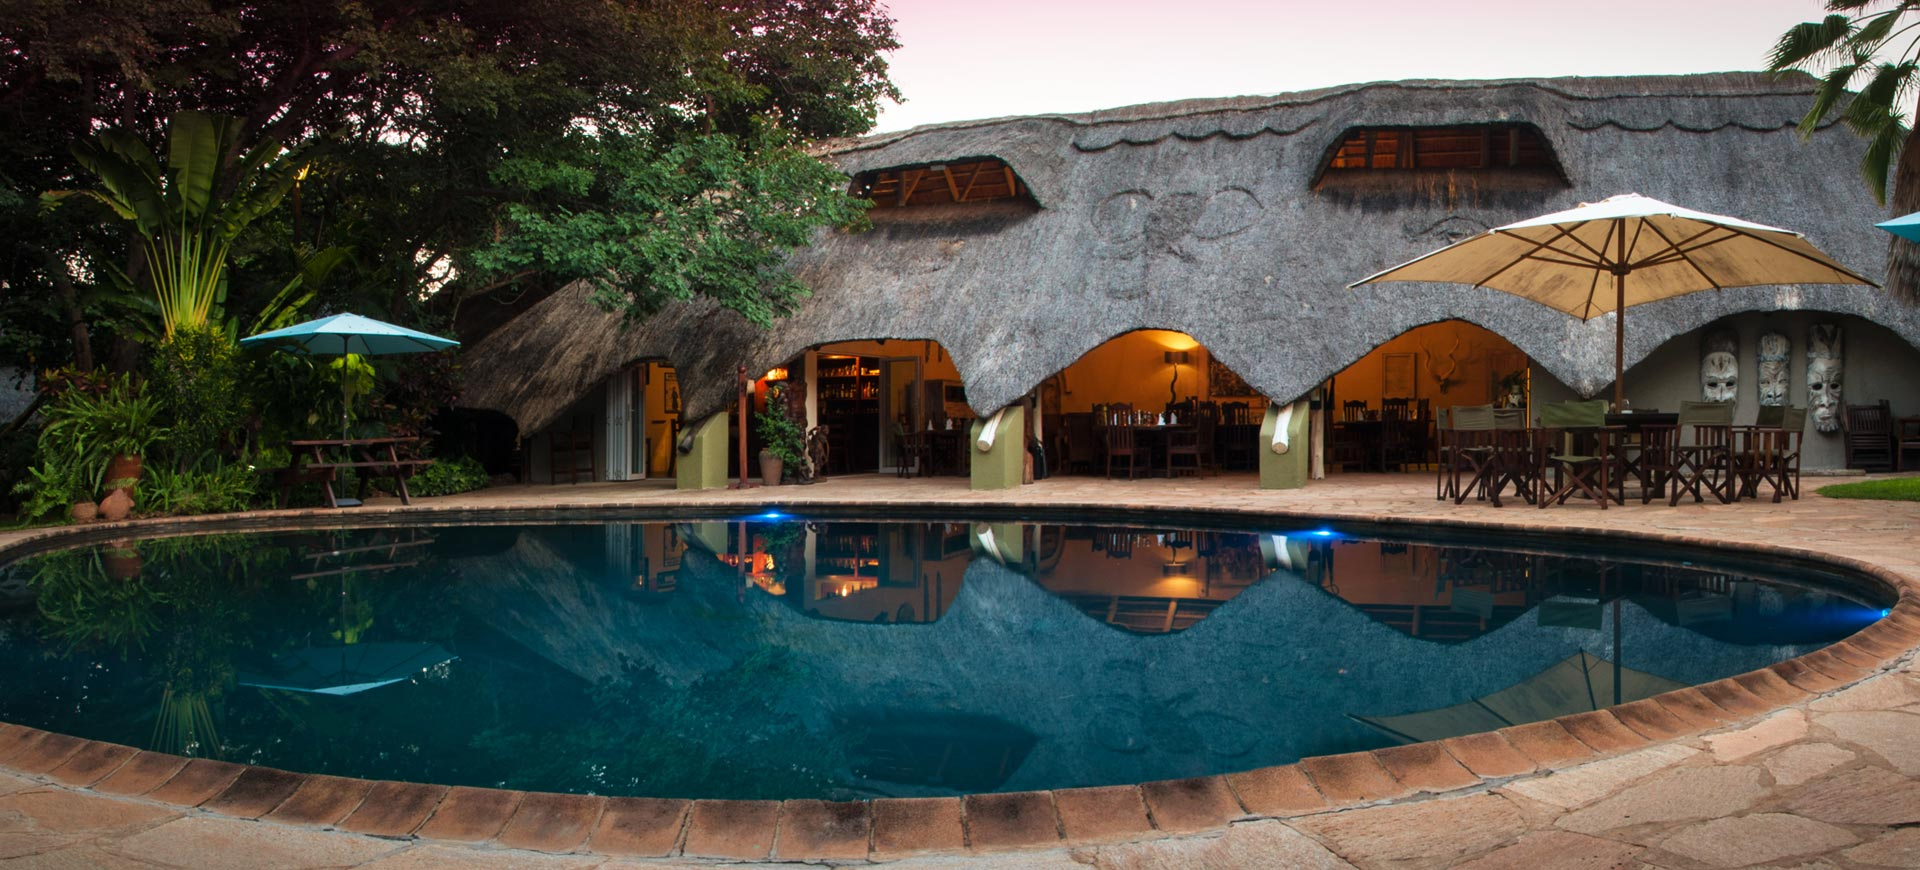 Bayete Lodge Evening